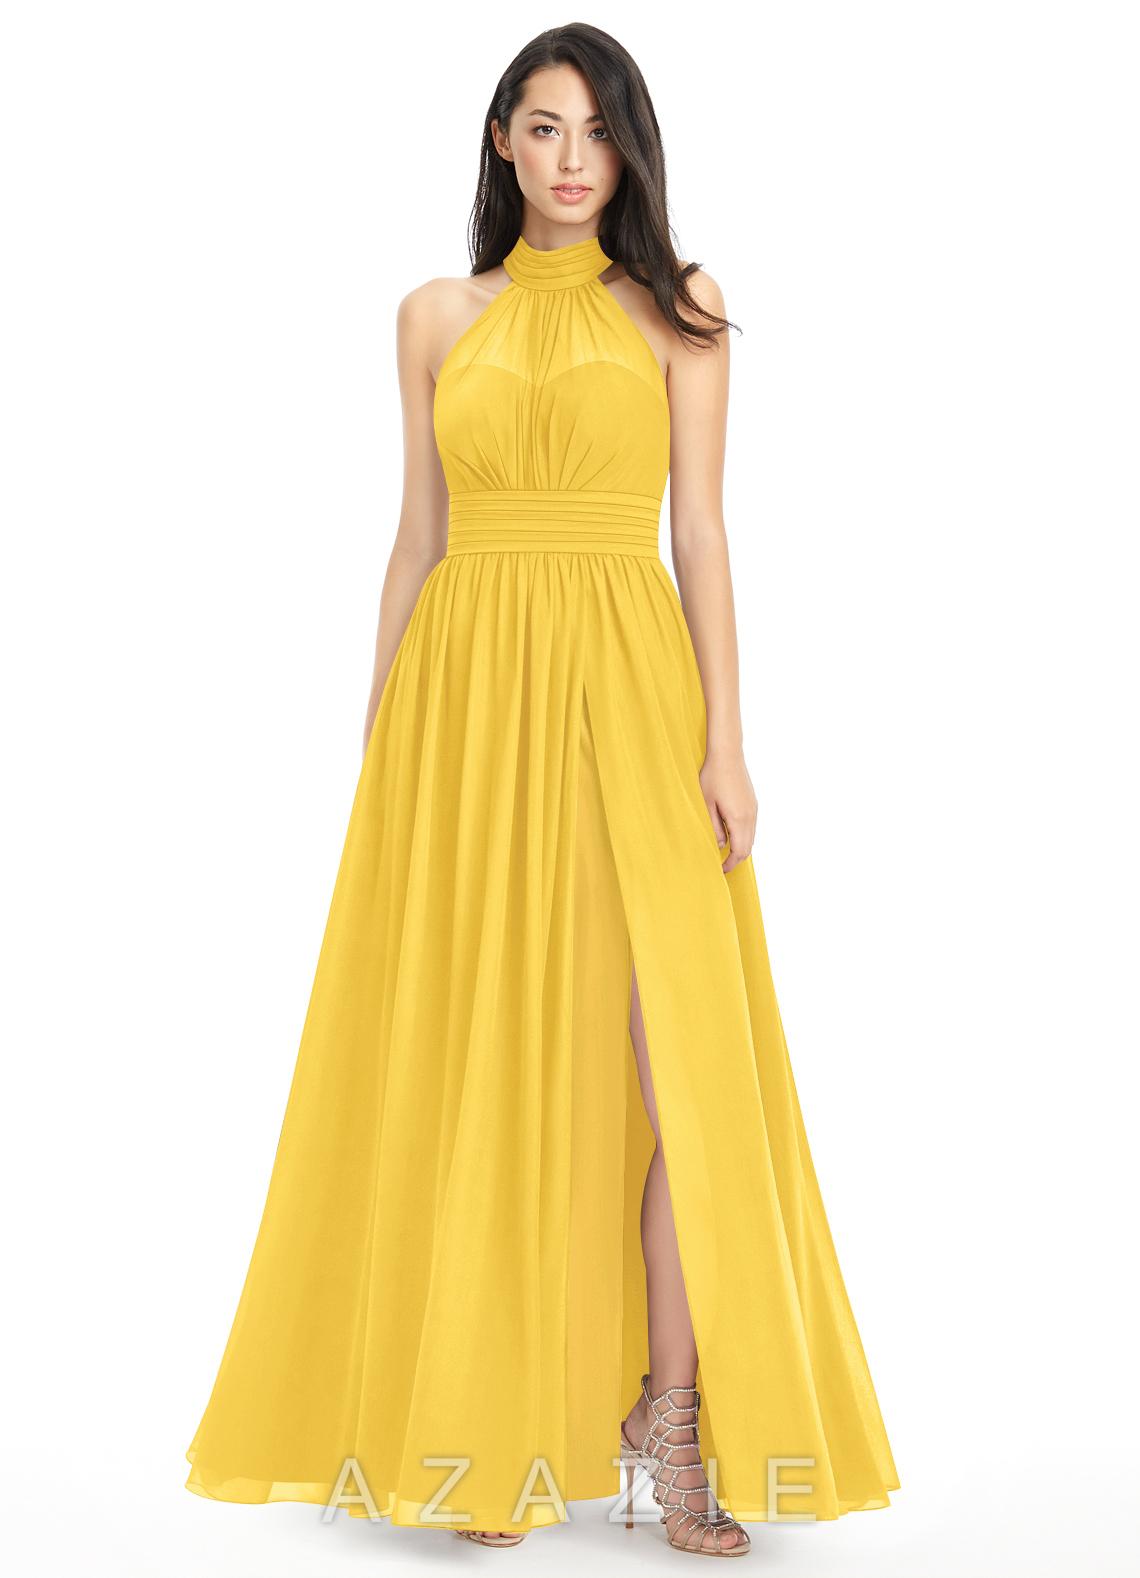 c26fc233d96 Azazie Iman Bridesmaid Dress - Marigold